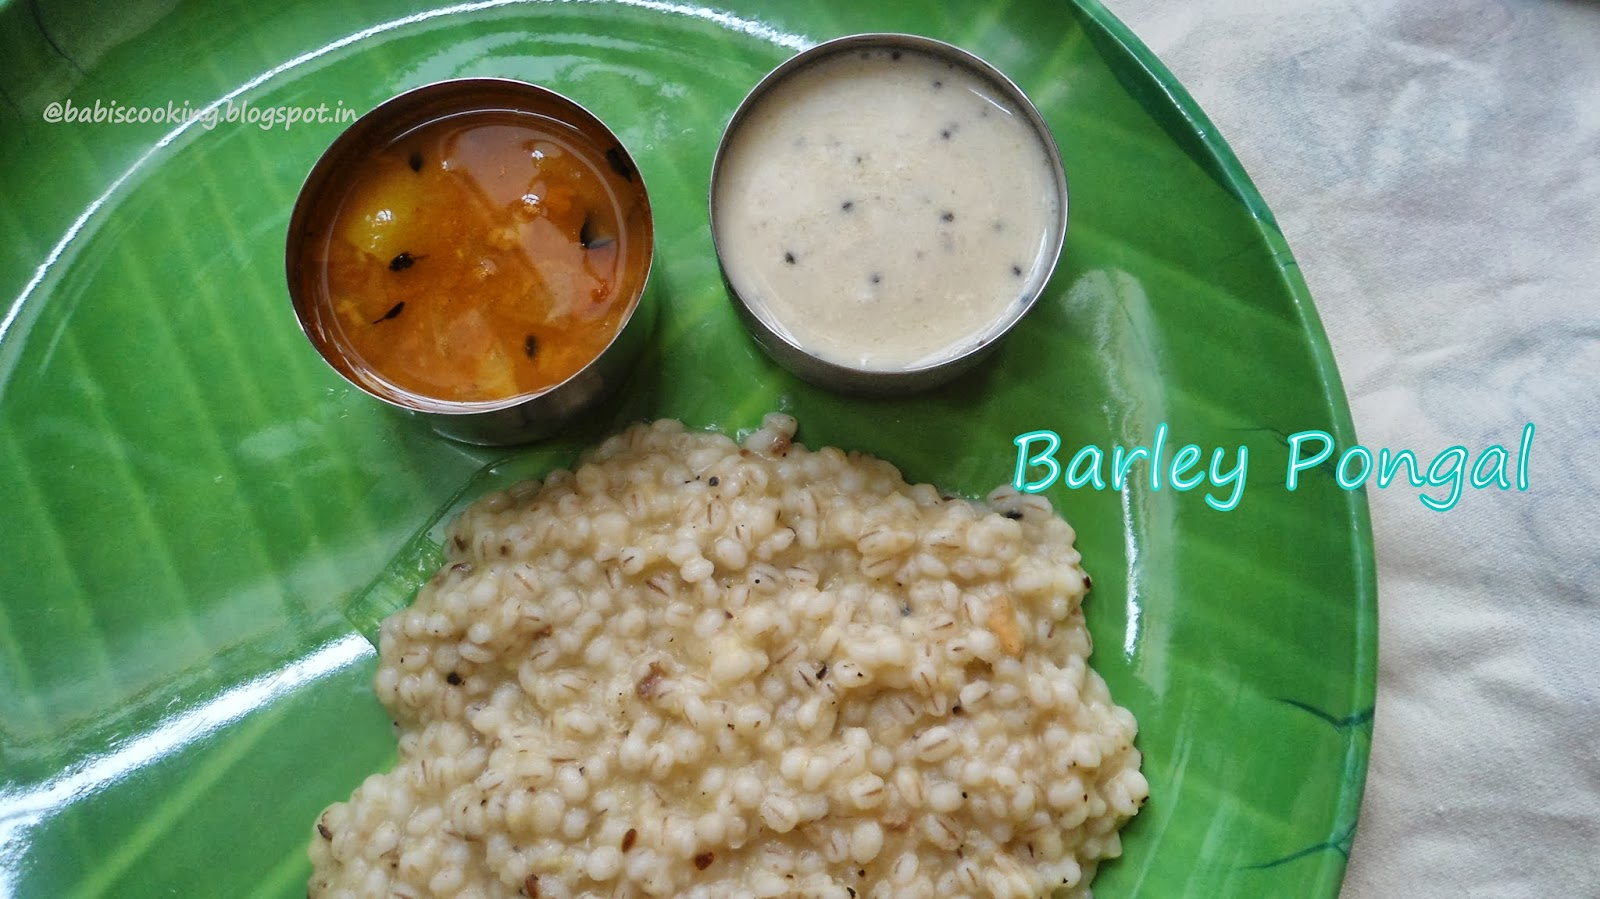 Babi 's Recipes: Barley Pongal | Healthy Indian Breakfast